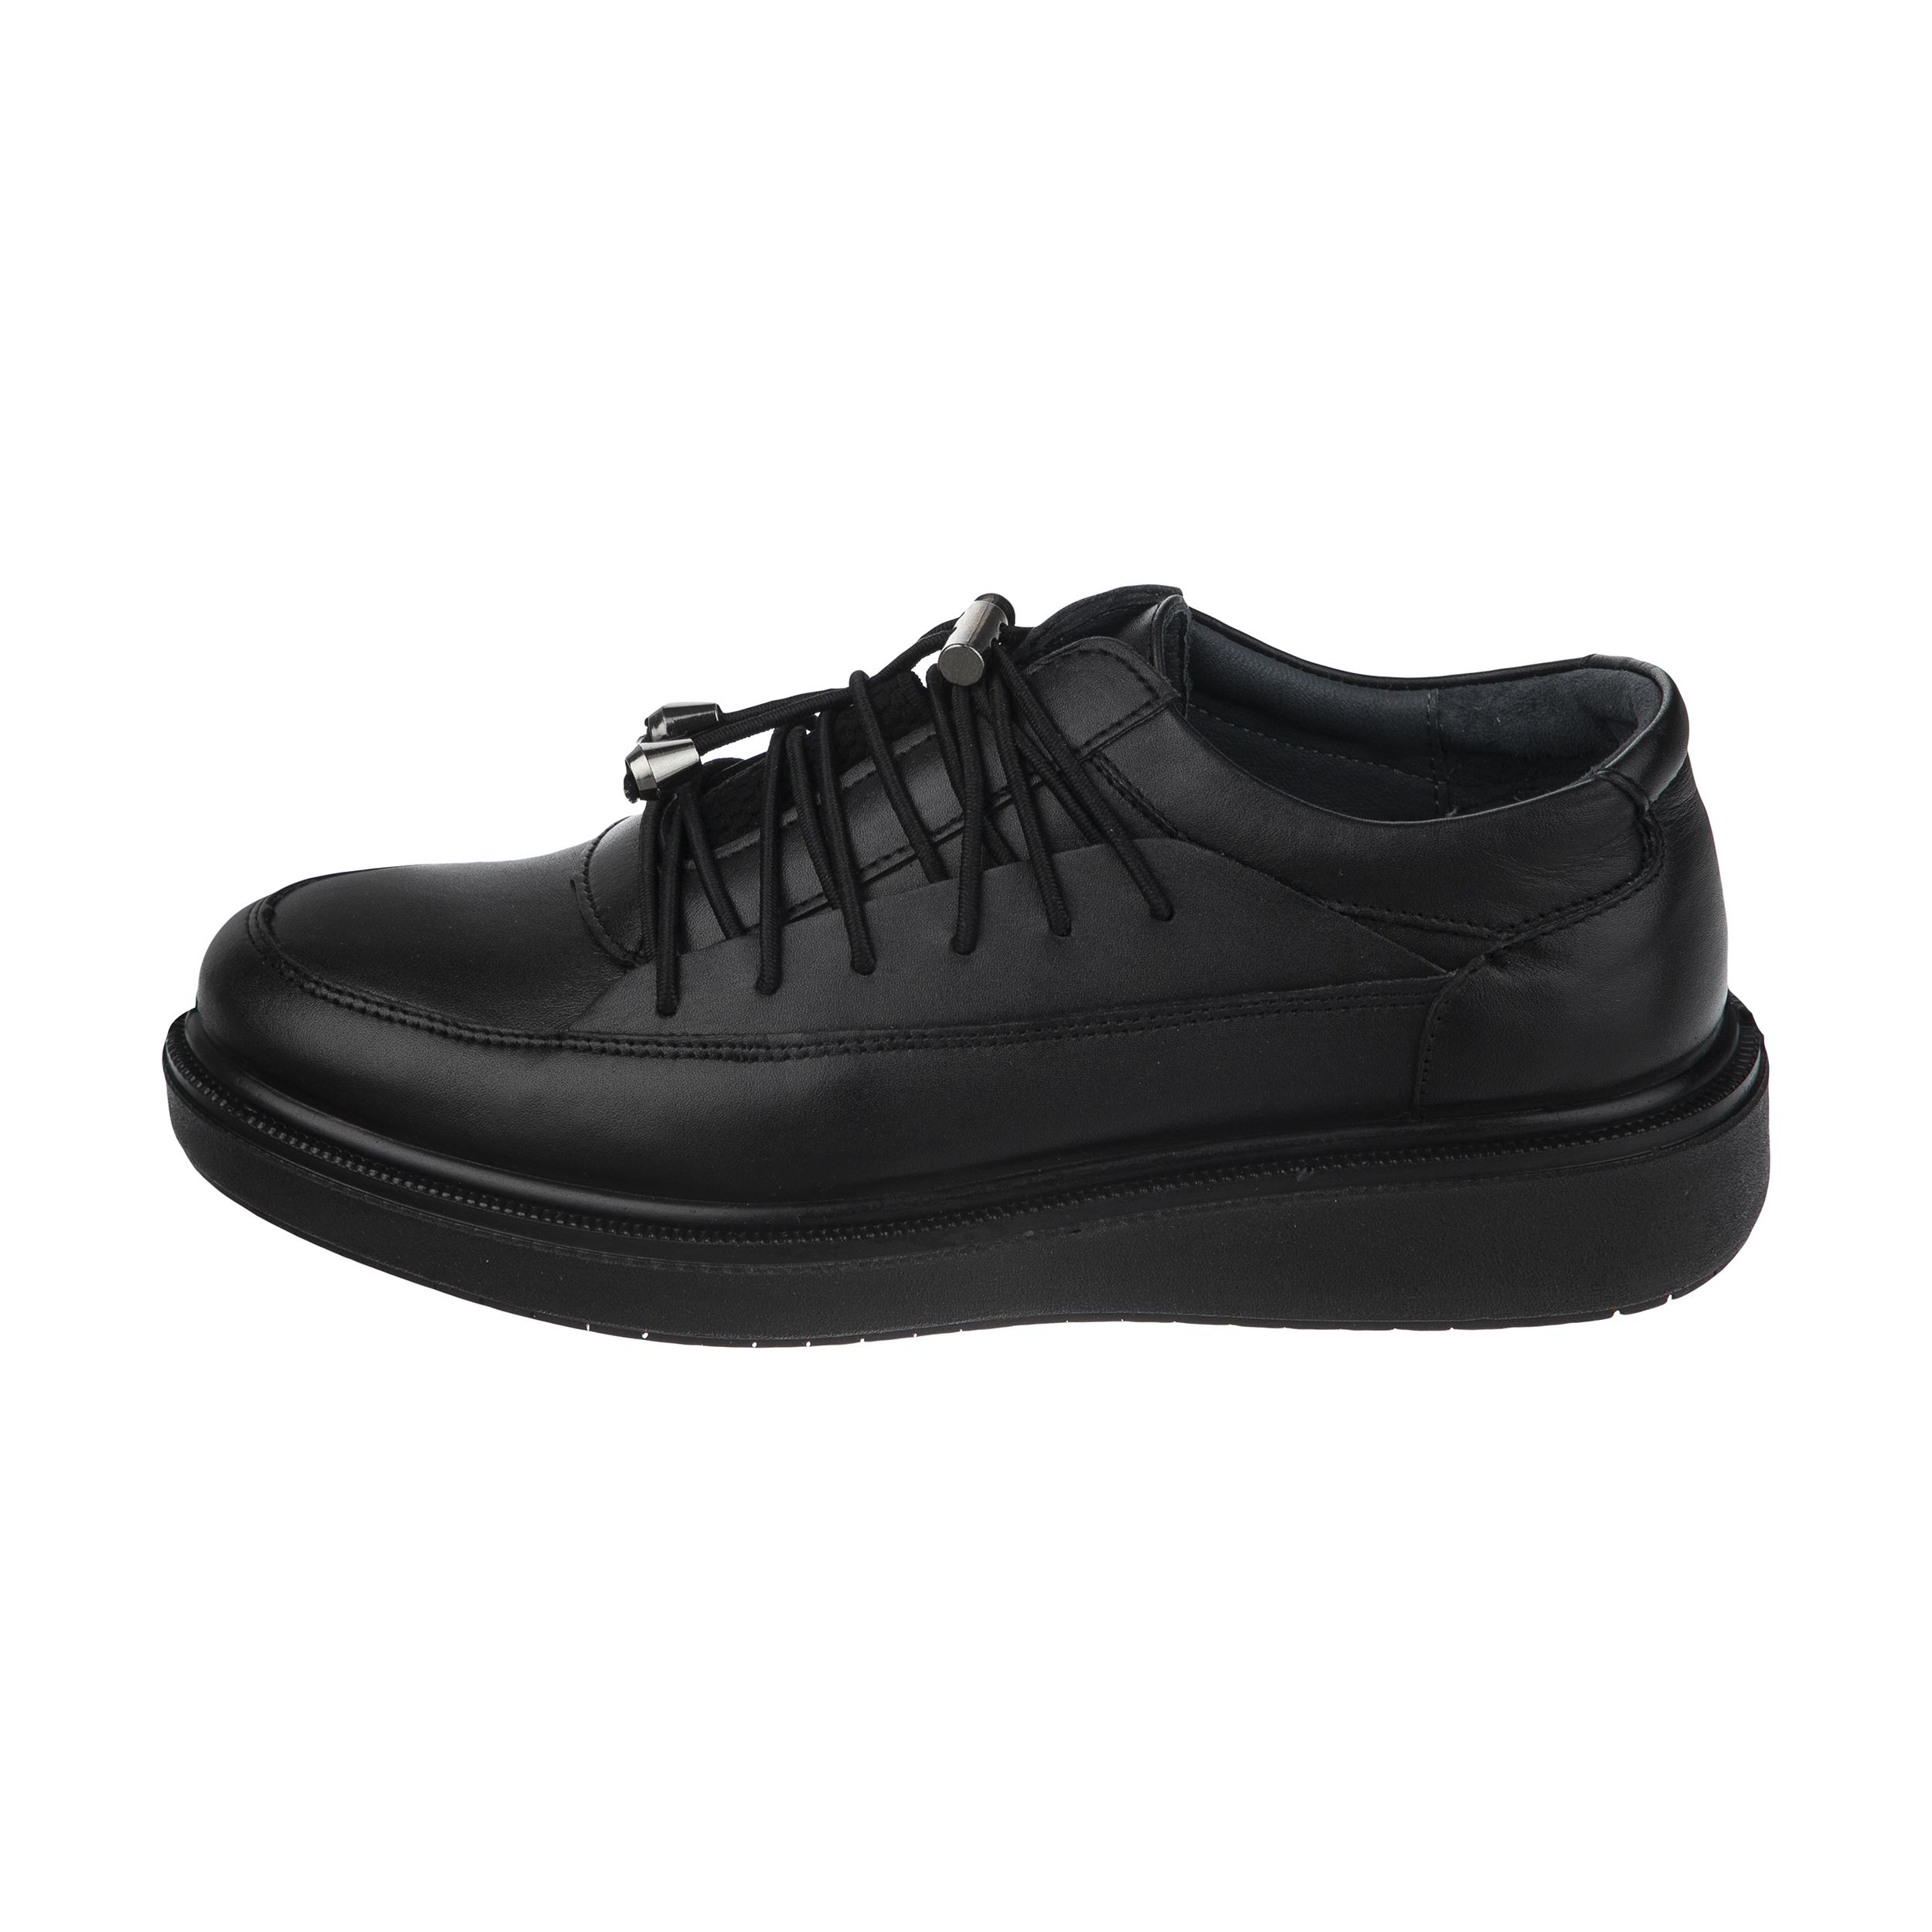 کفش روزمره مردانه آقانژاد مدل 10011-99